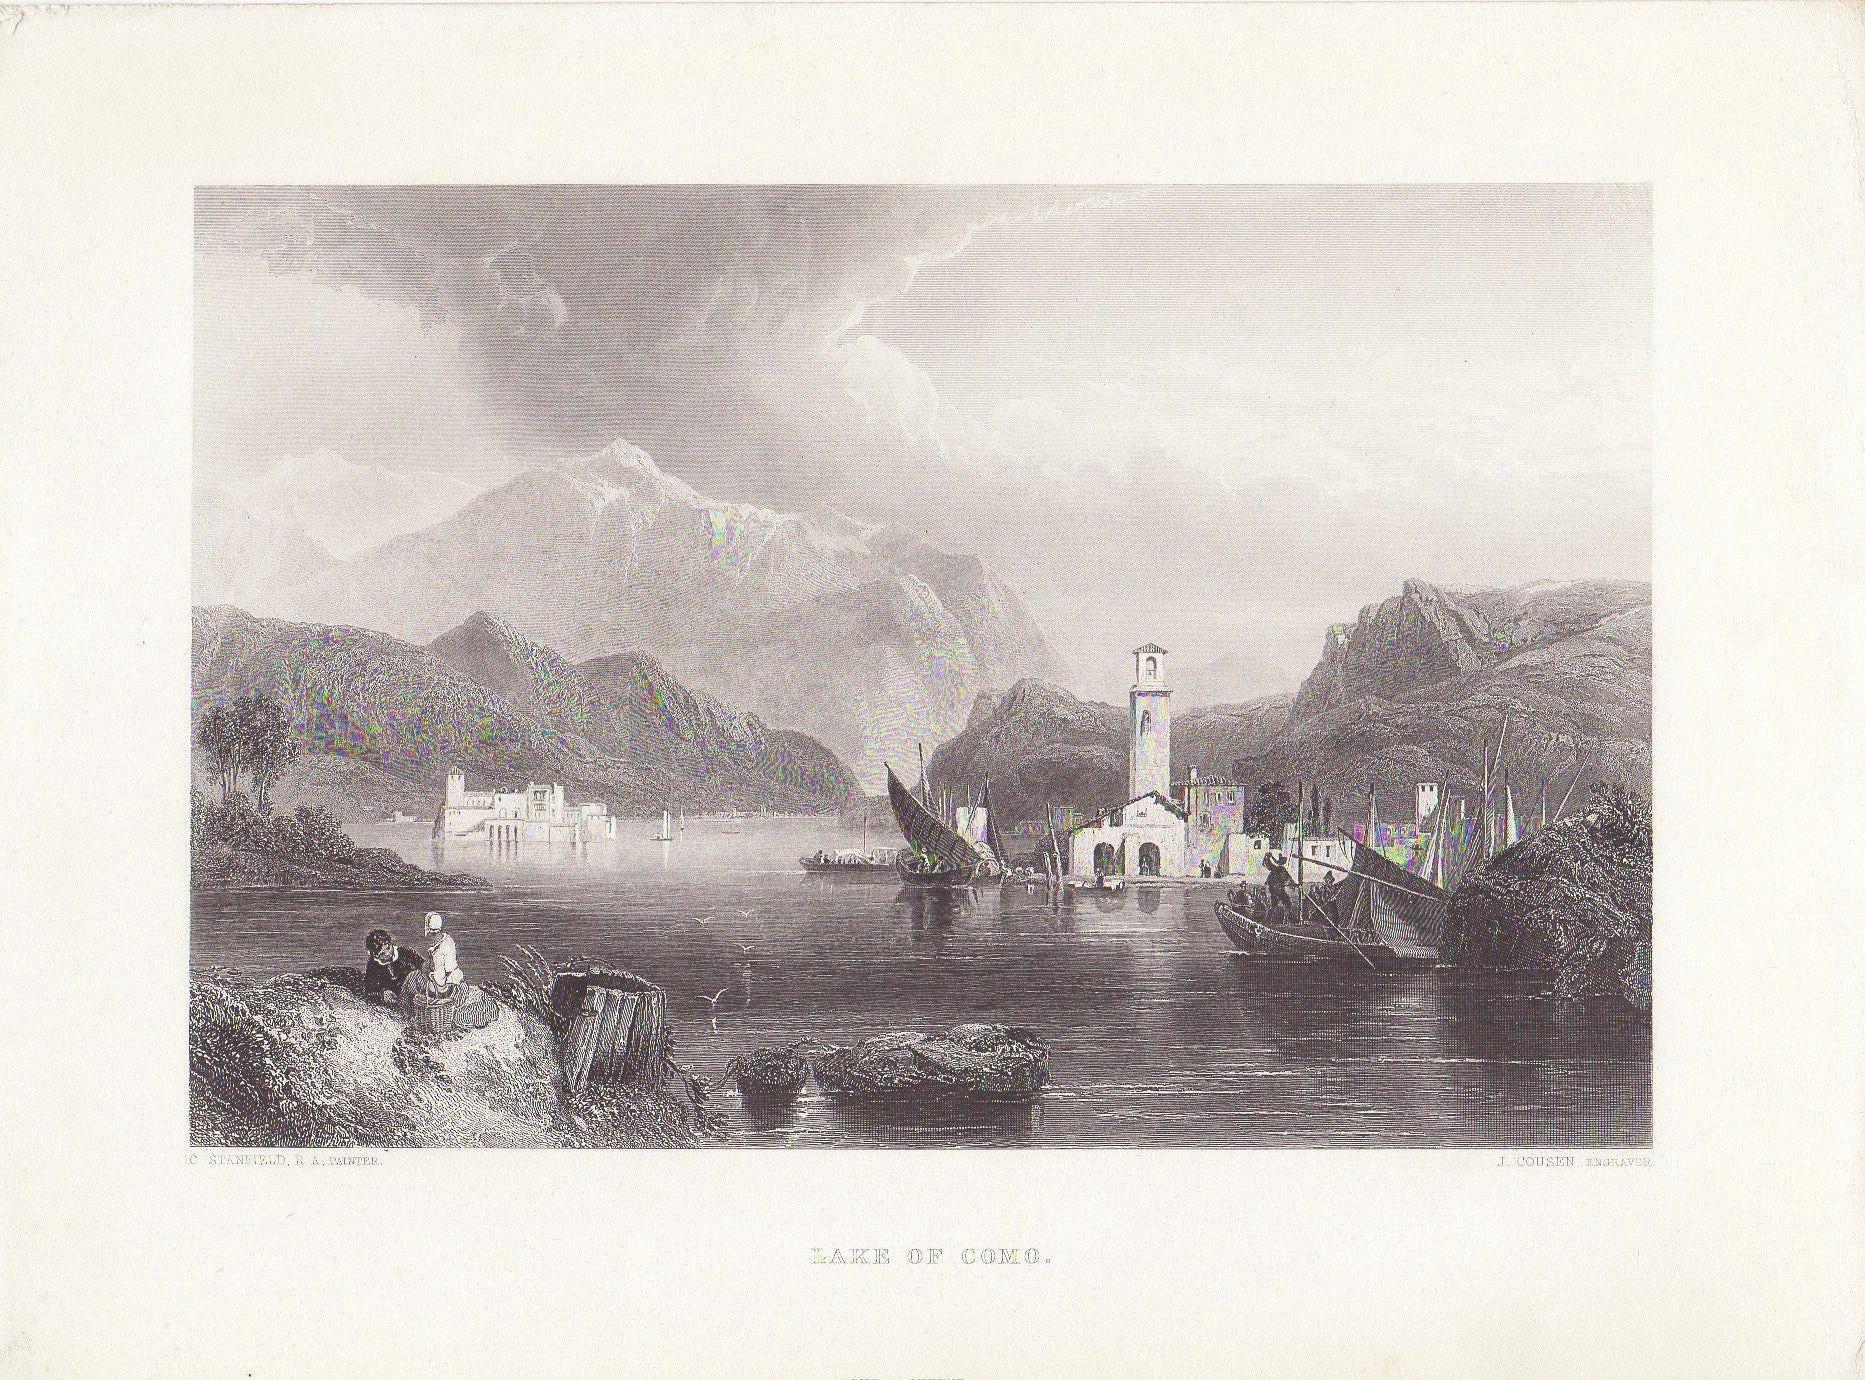 1875 Italien Lombardei Comersee antike Paris drucken